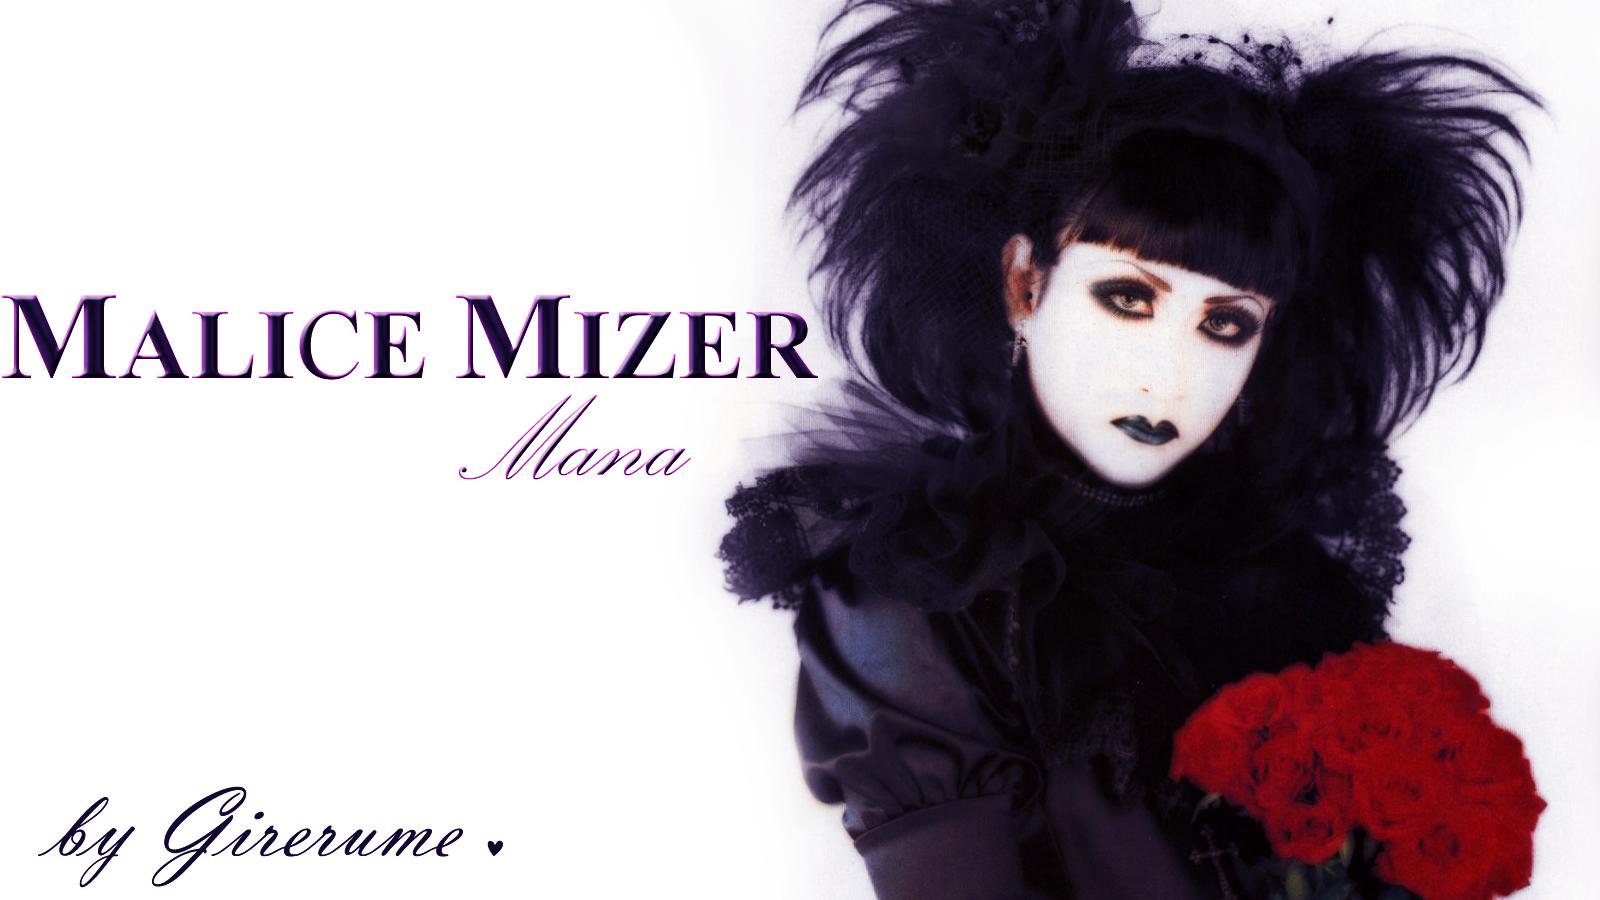 http://2.bp.blogspot.com/-6NH6tqB2Gkw/Tb7vqk8pzFI/AAAAAAAABYg/y74hBhjrNbA/s1600/wallpaper___mana_malice_mizer_by_girerume-d33ydcg.png